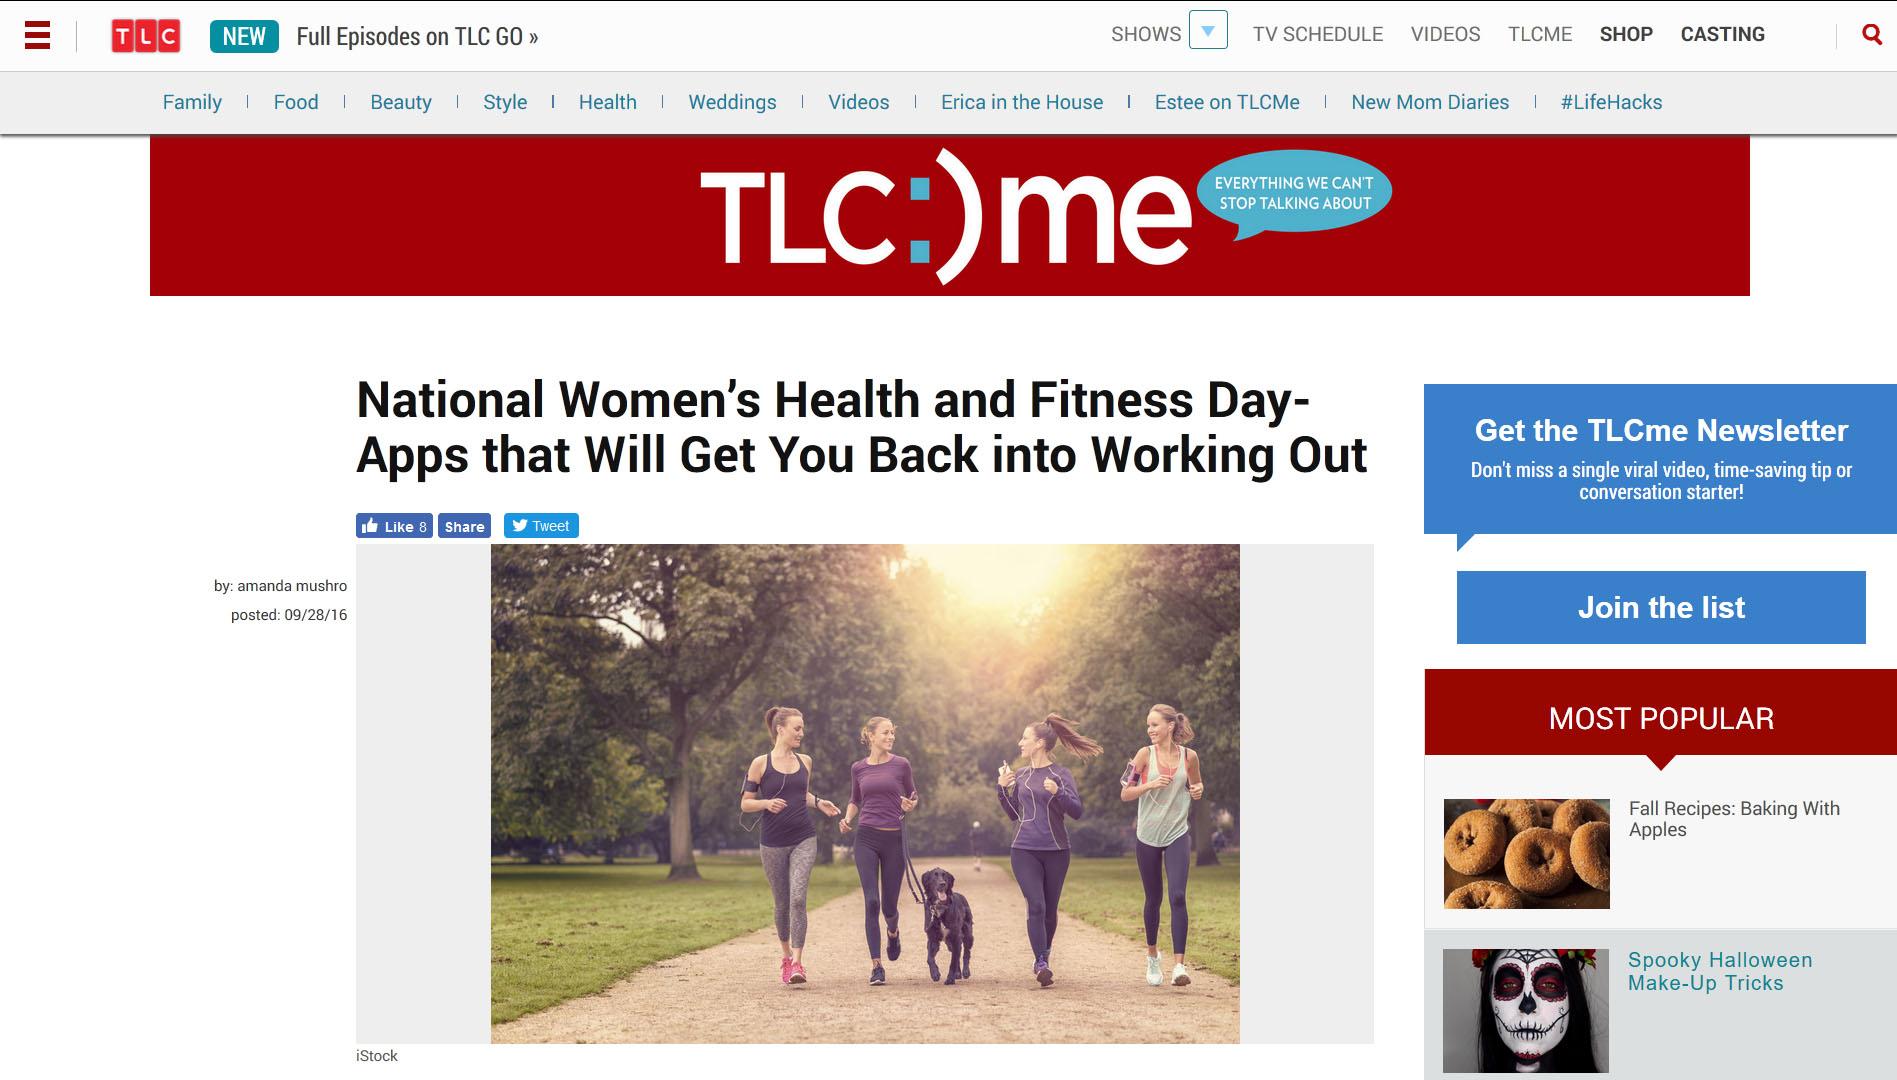 TLC Womens National Health